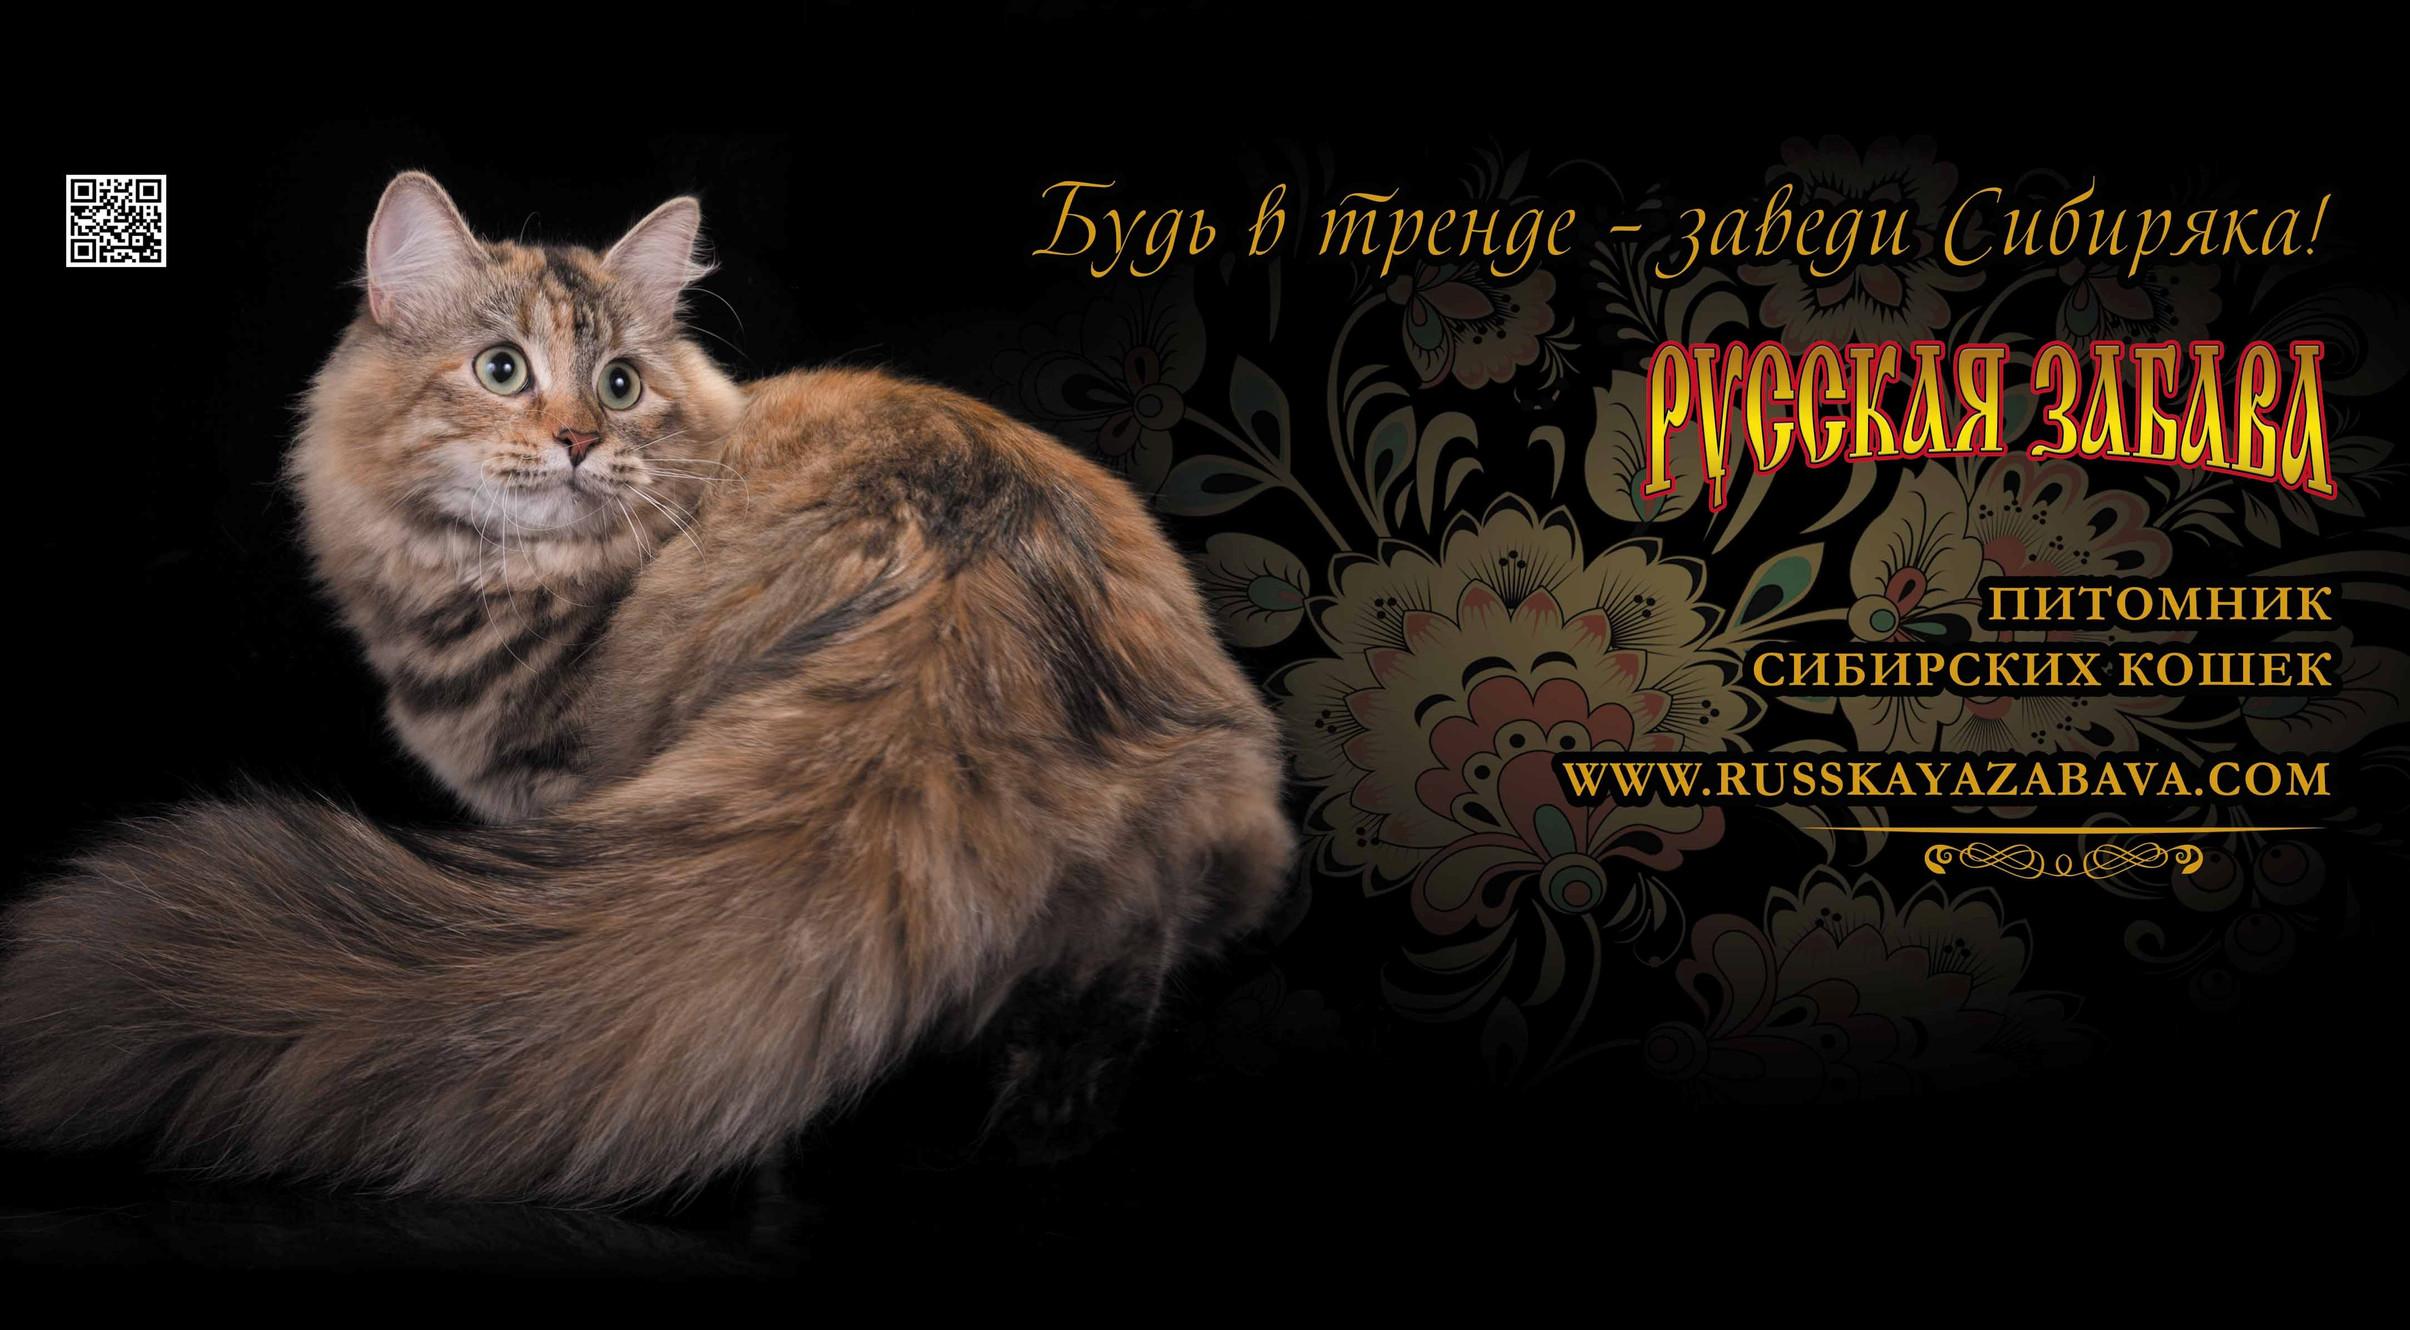 клубы сибирских кошек москва